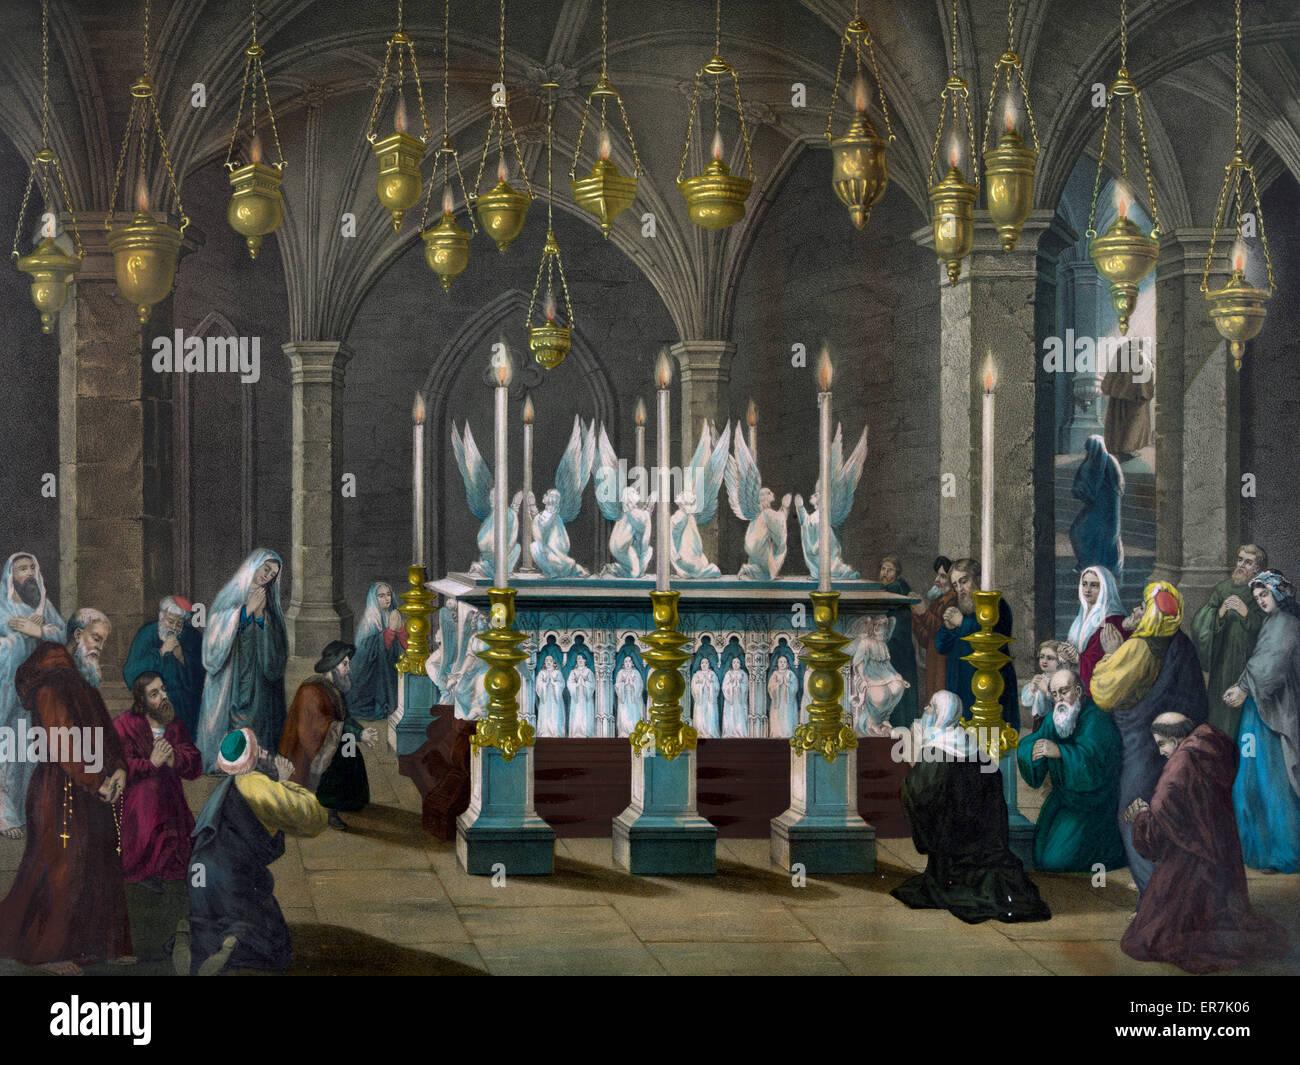 Das Grab Christi. Stockbild